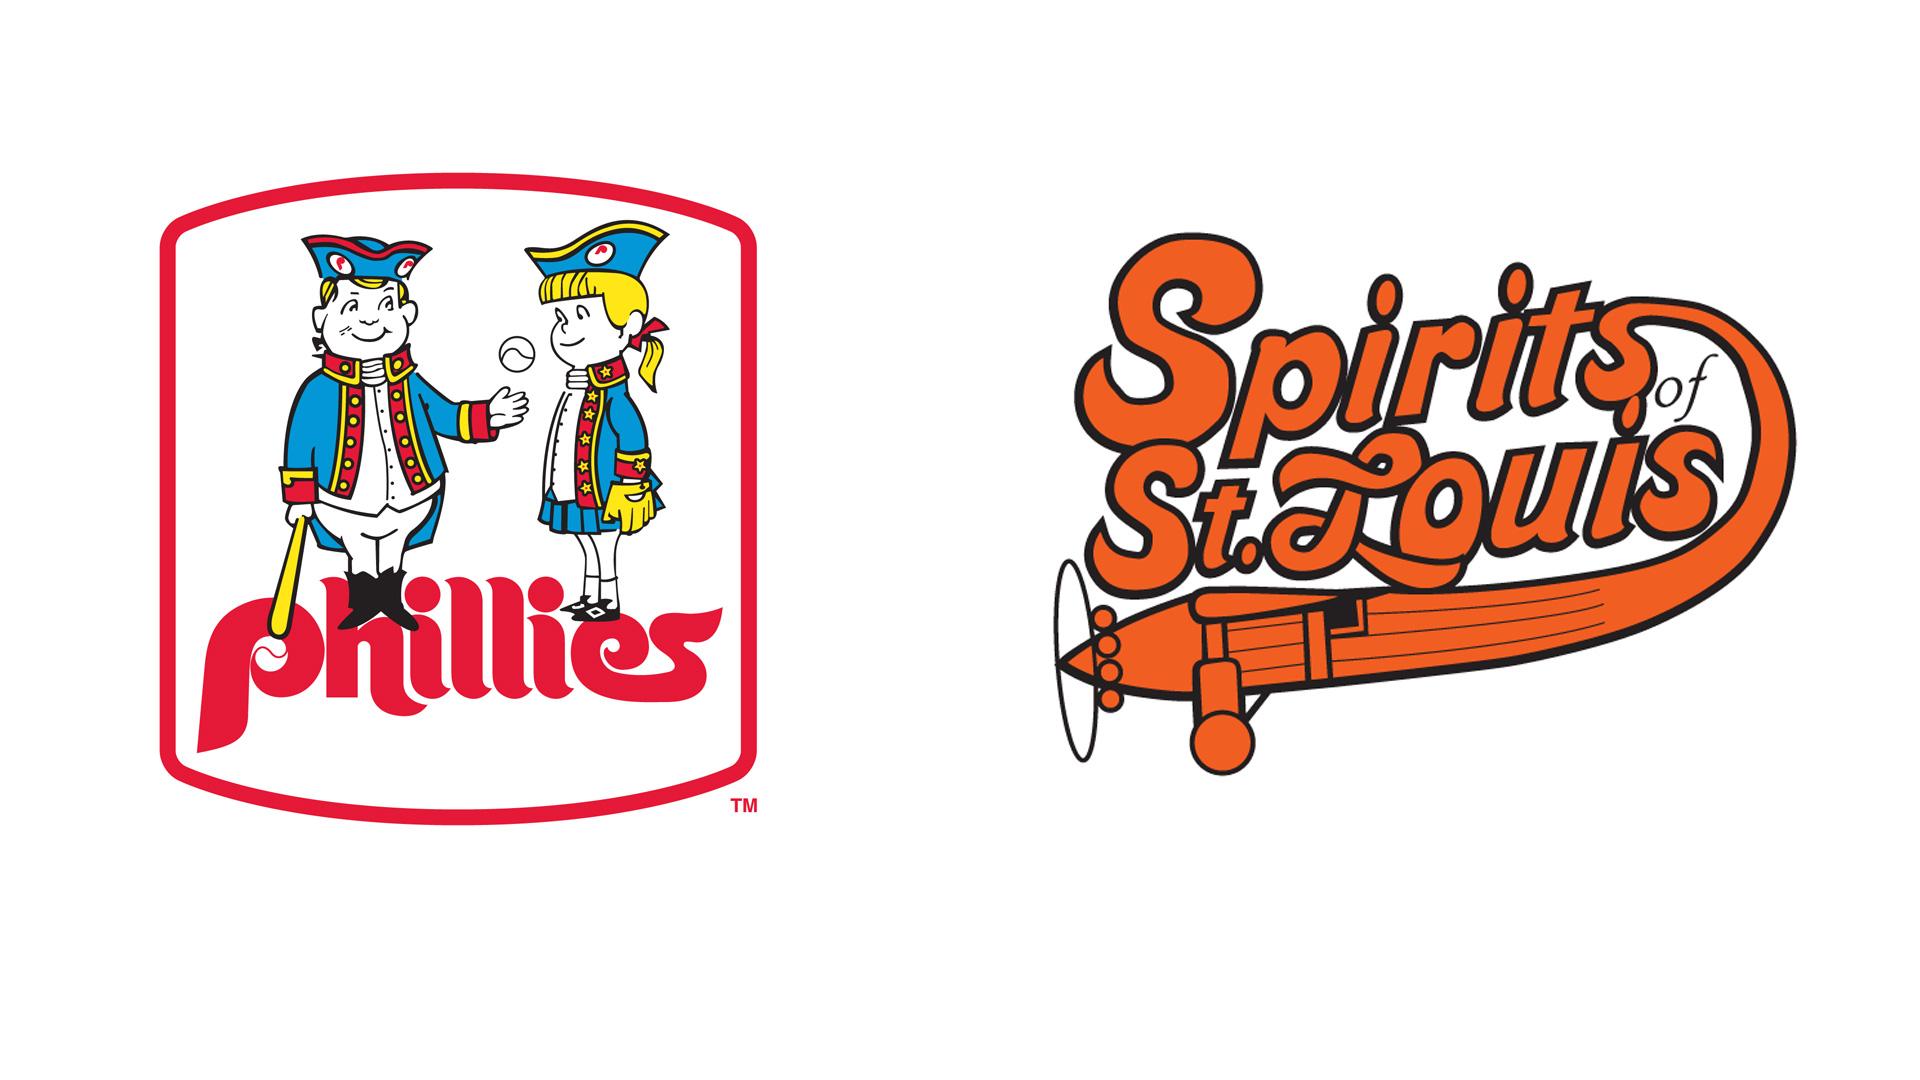 logos sports 70s decade aba houston sporting disco classic sport 1970s est